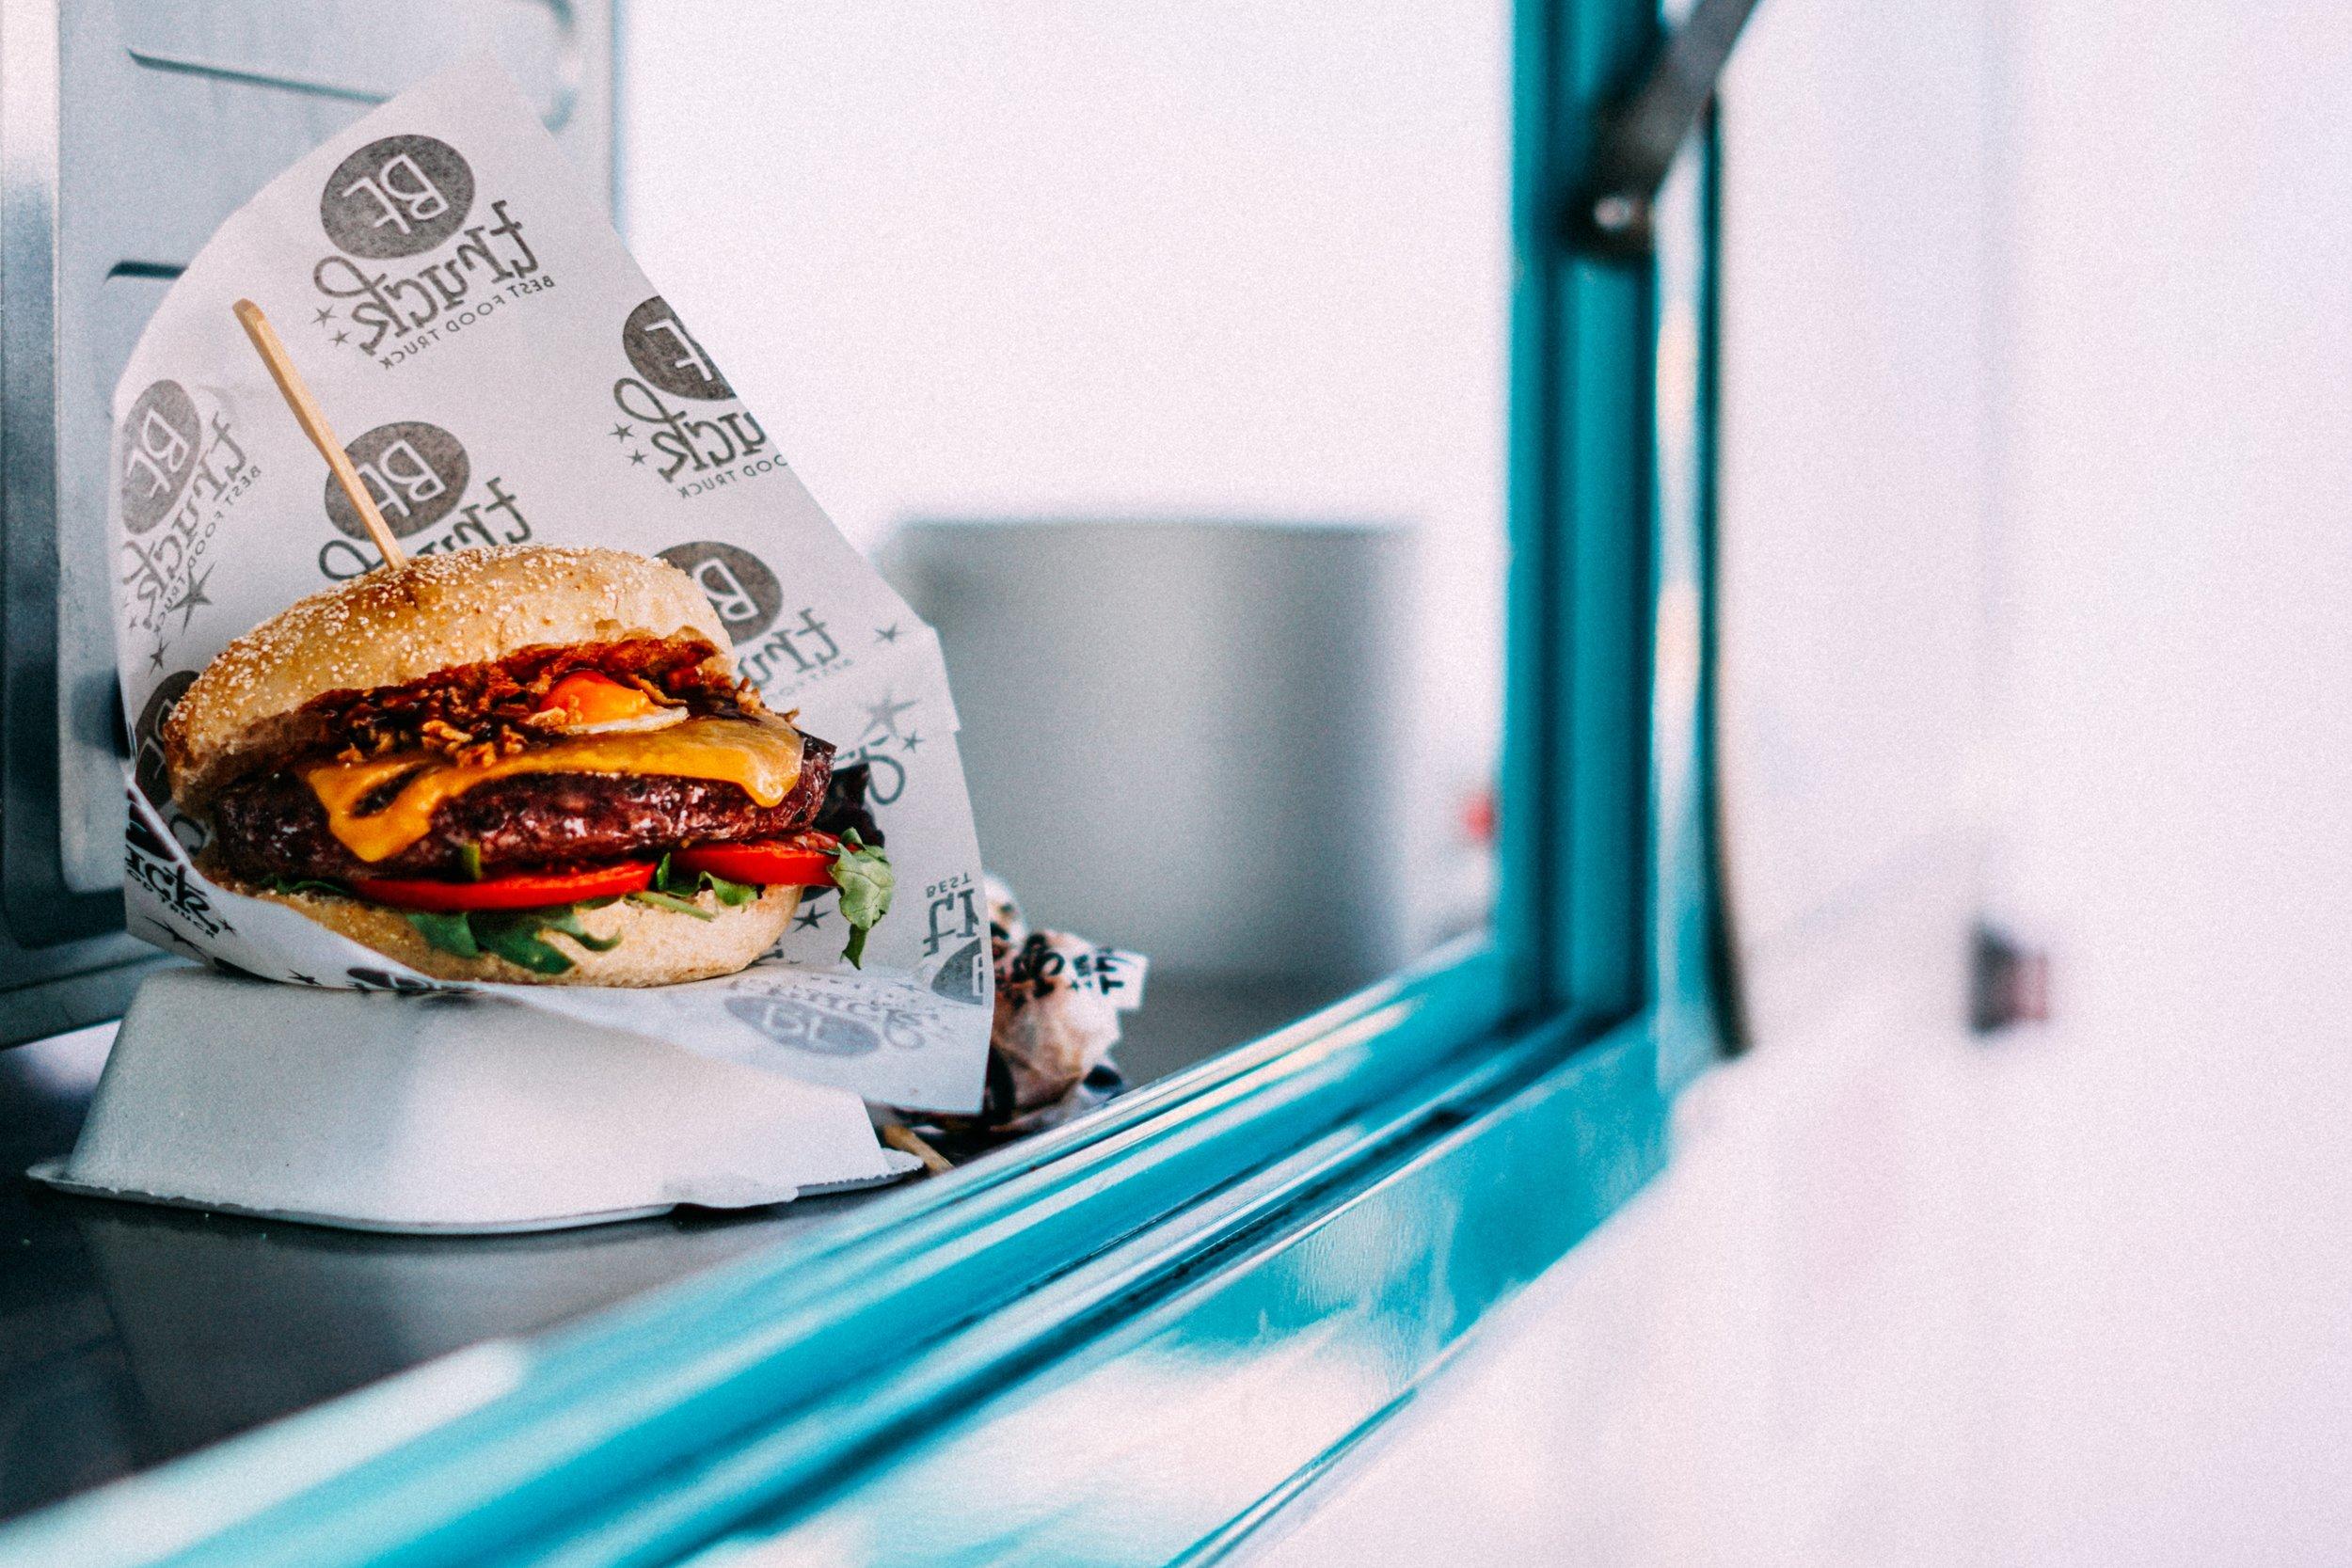 beef-blur-bread-1053769.jpg